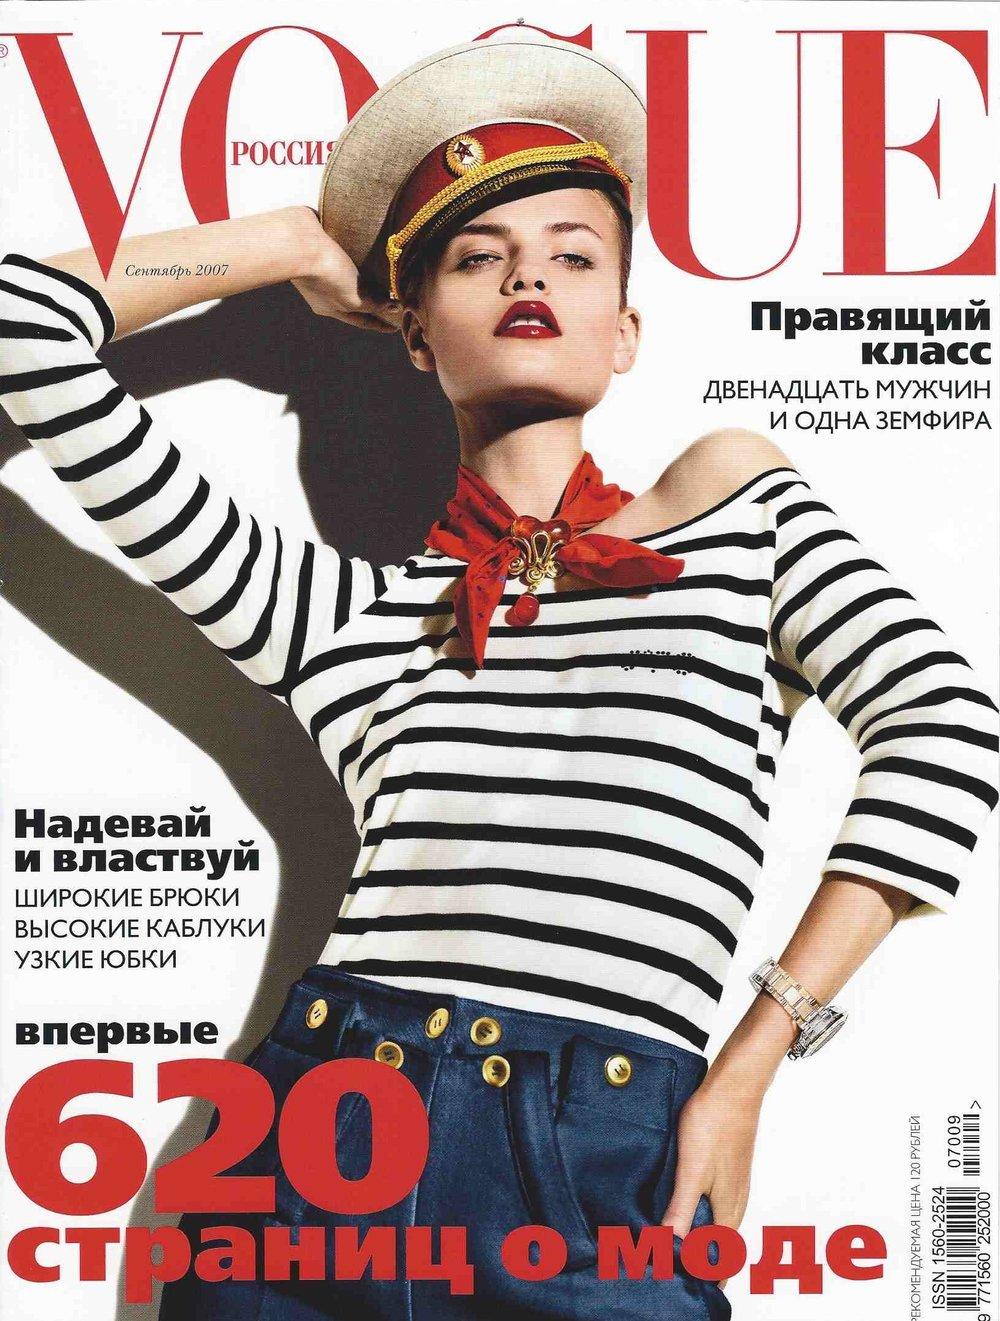 Miguel Riveriego - Russian Vogue - Natasha Poly copy.jpg